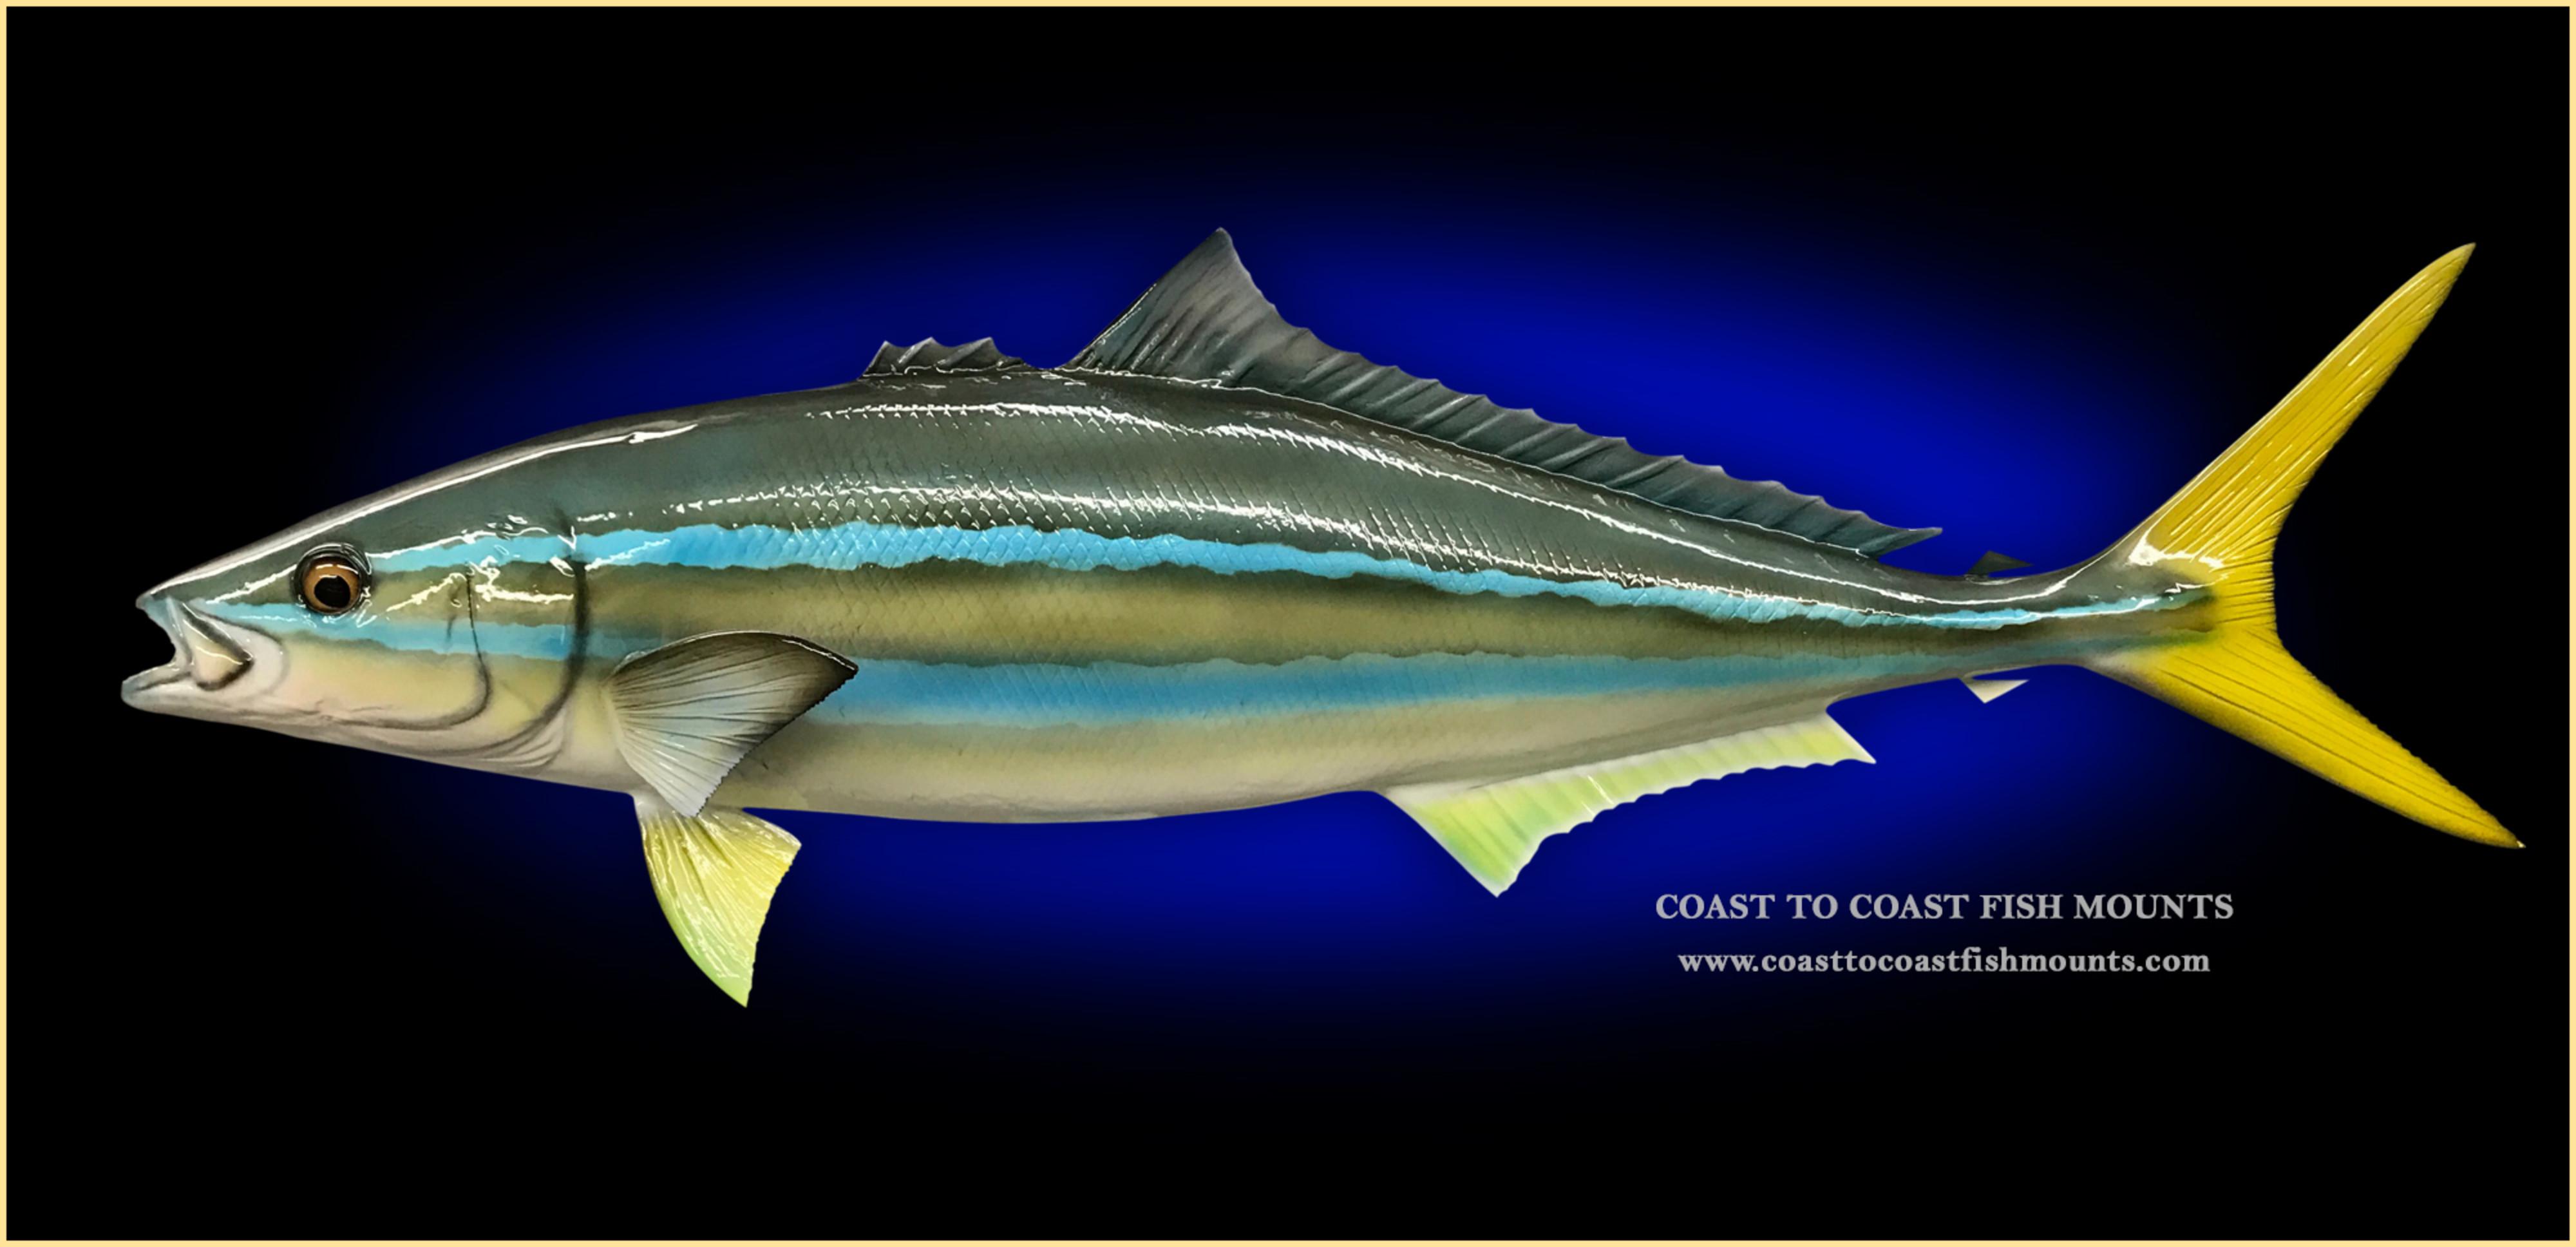 Rainbow Runner Fish Mount and Fish Replicas | Coast-to-Coast